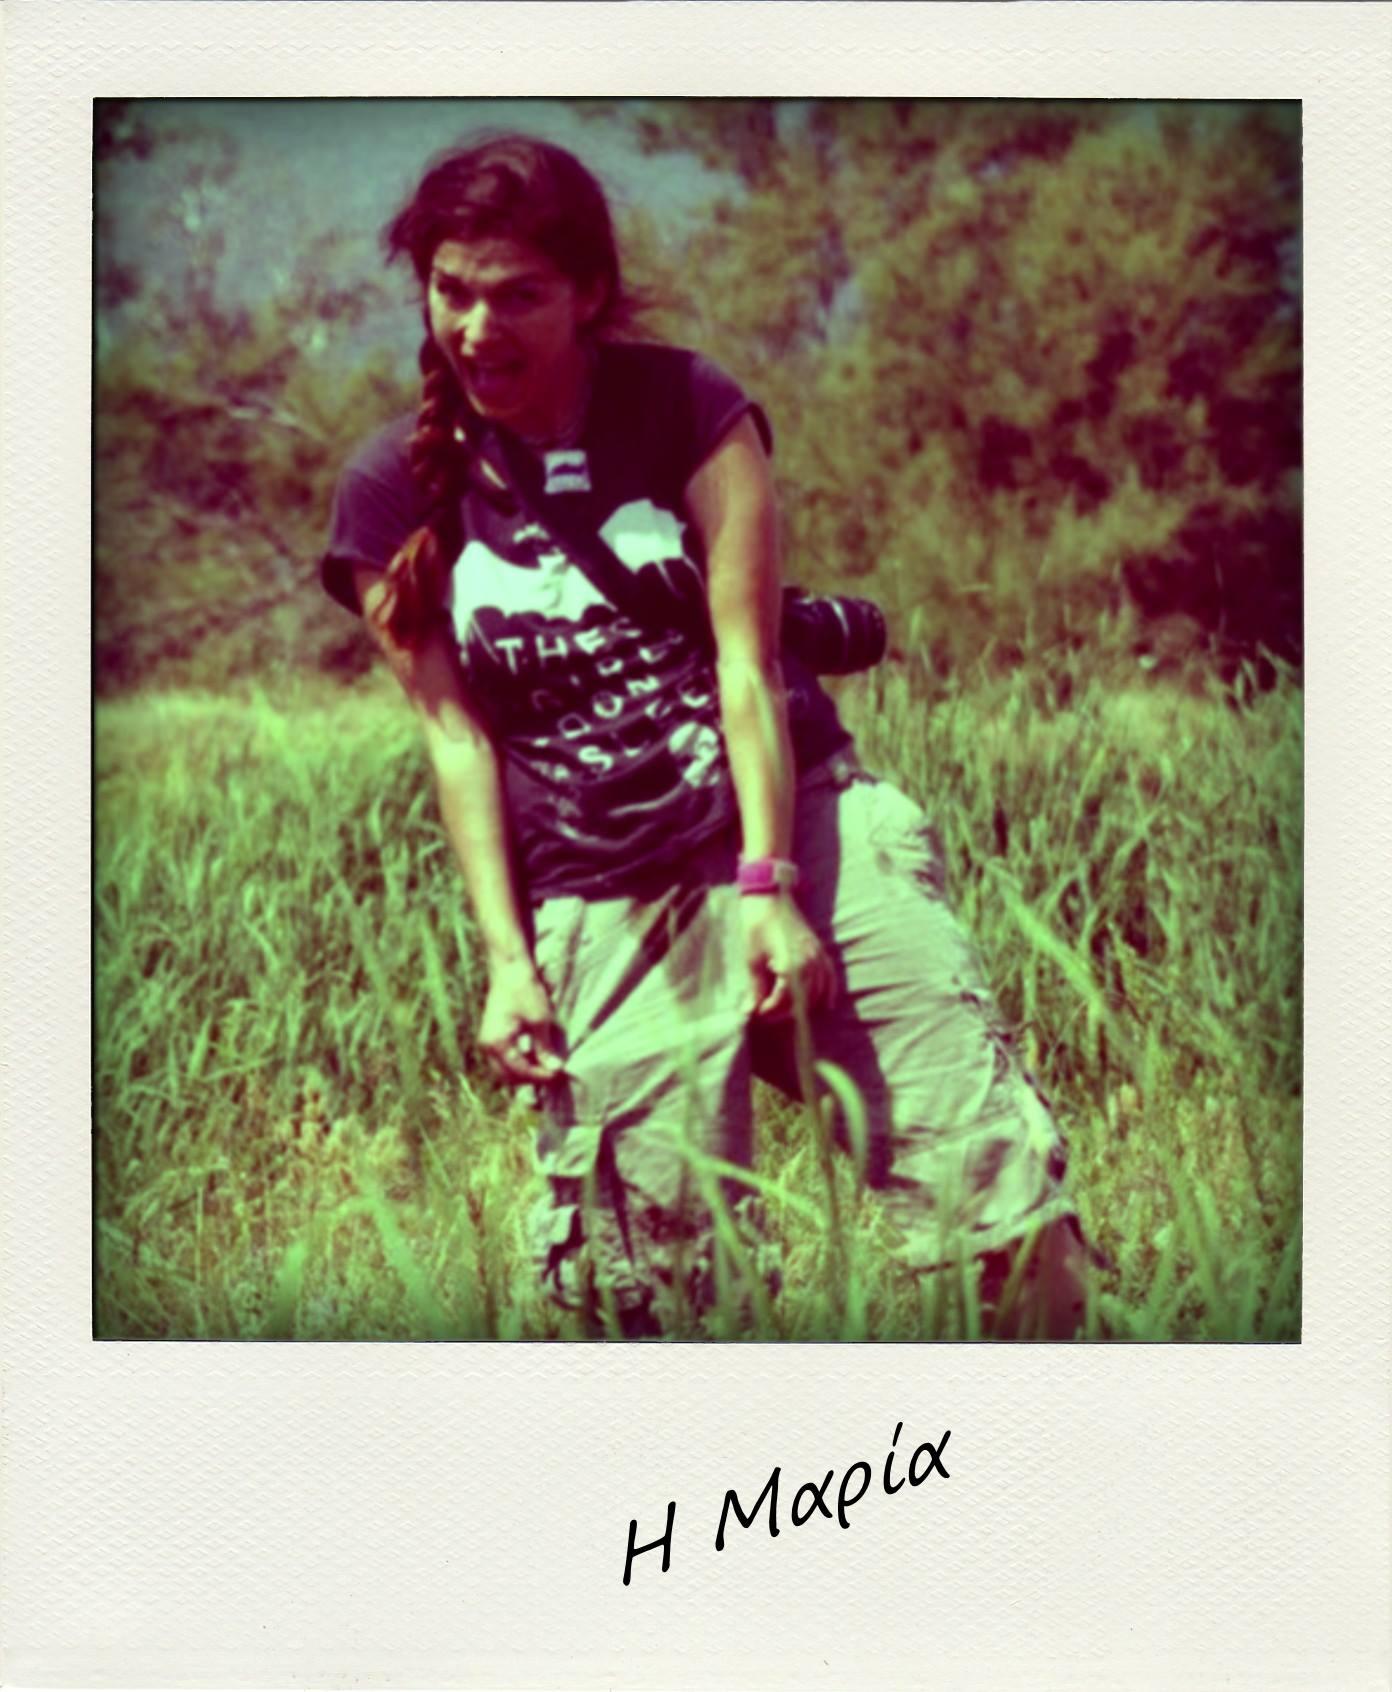 maria-pola